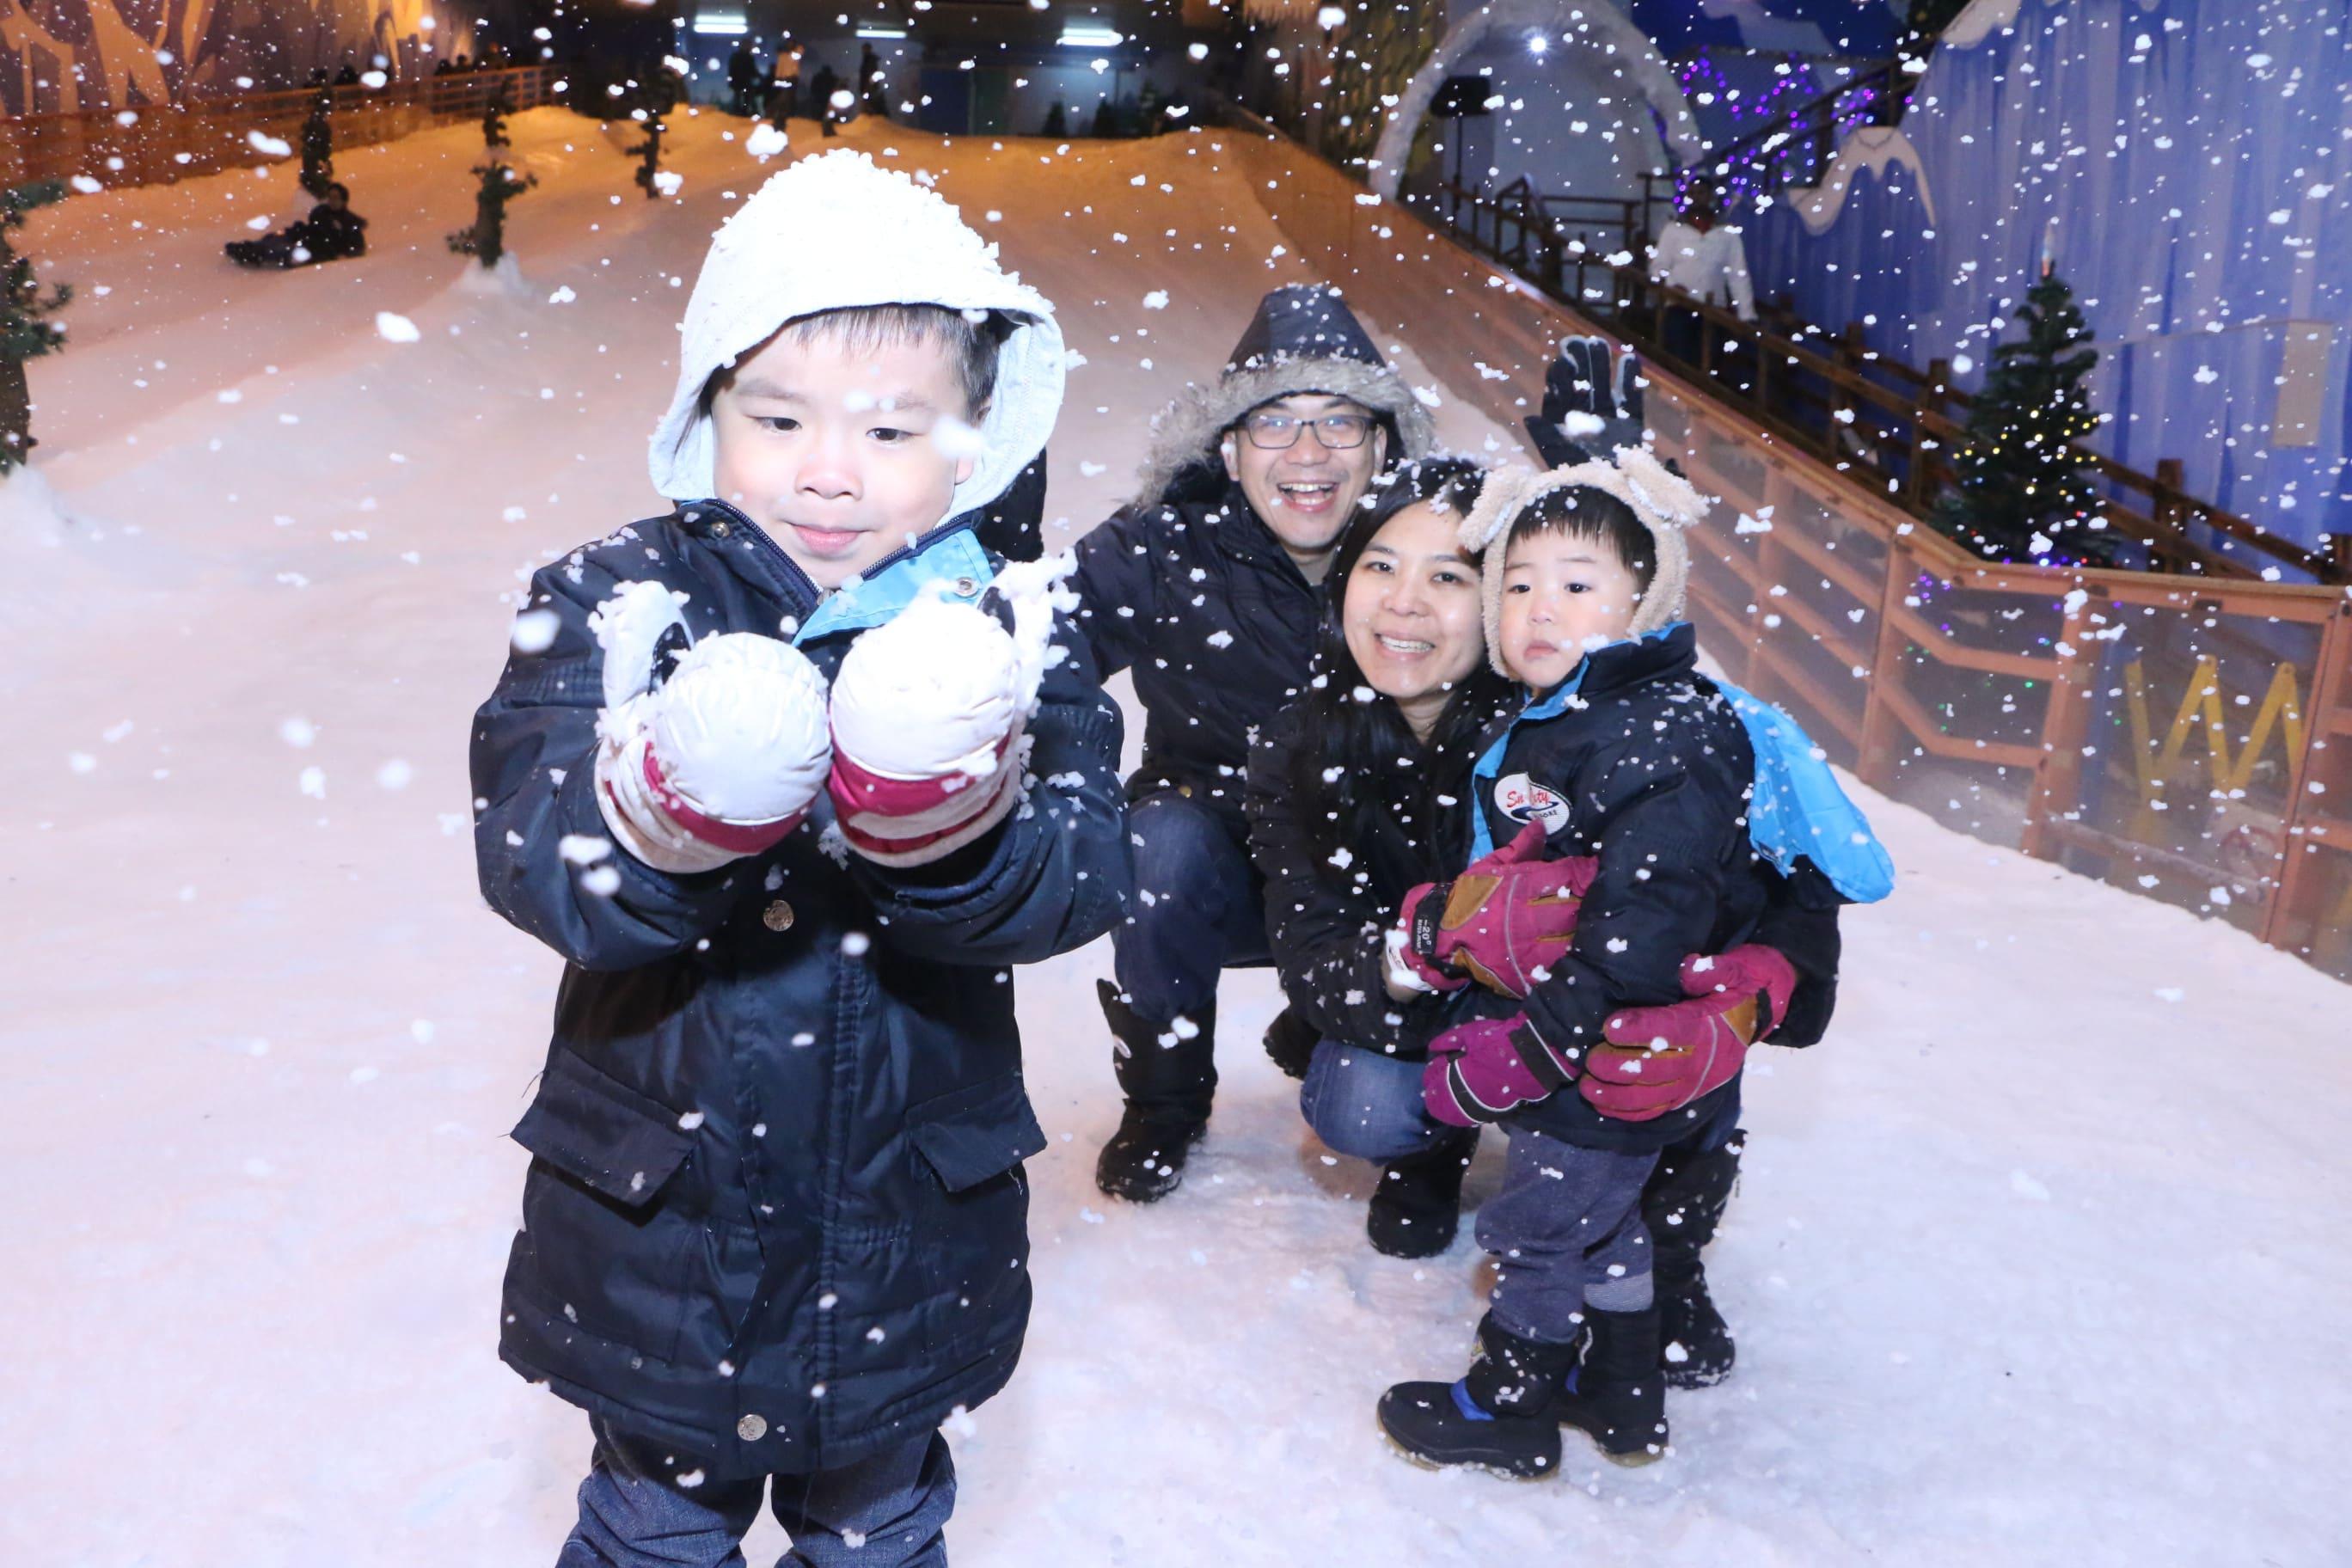 trẻ em chơi tuyết tại winter wonderland